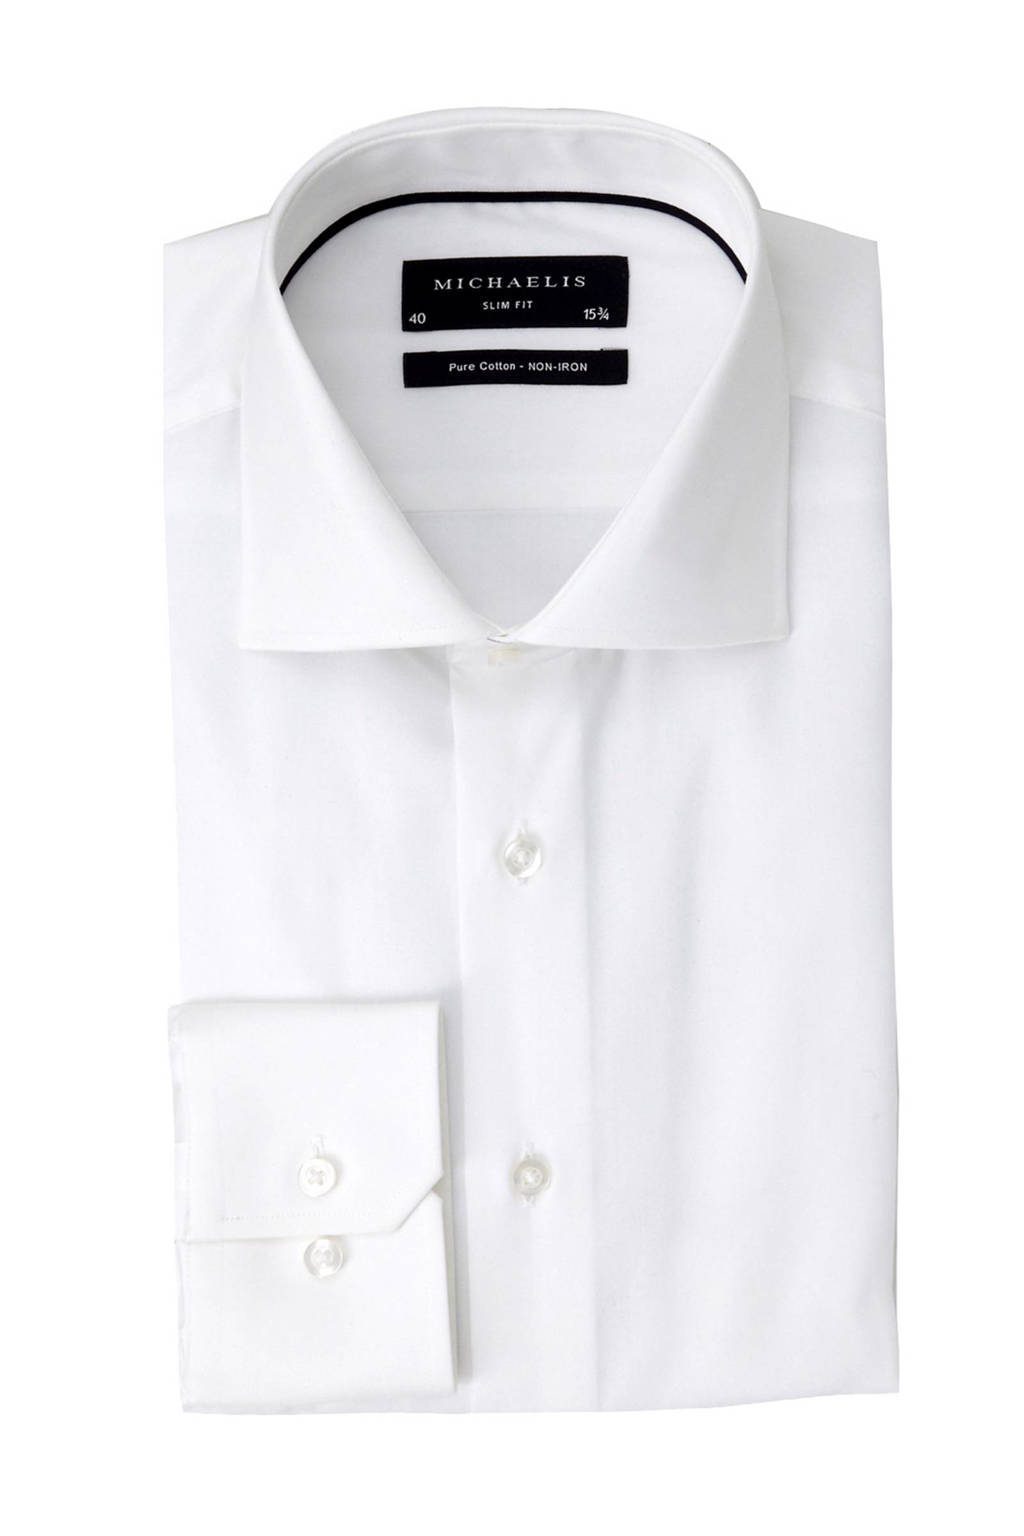 Michaelis slim fit overhemd - mouwlengte 7, Wit